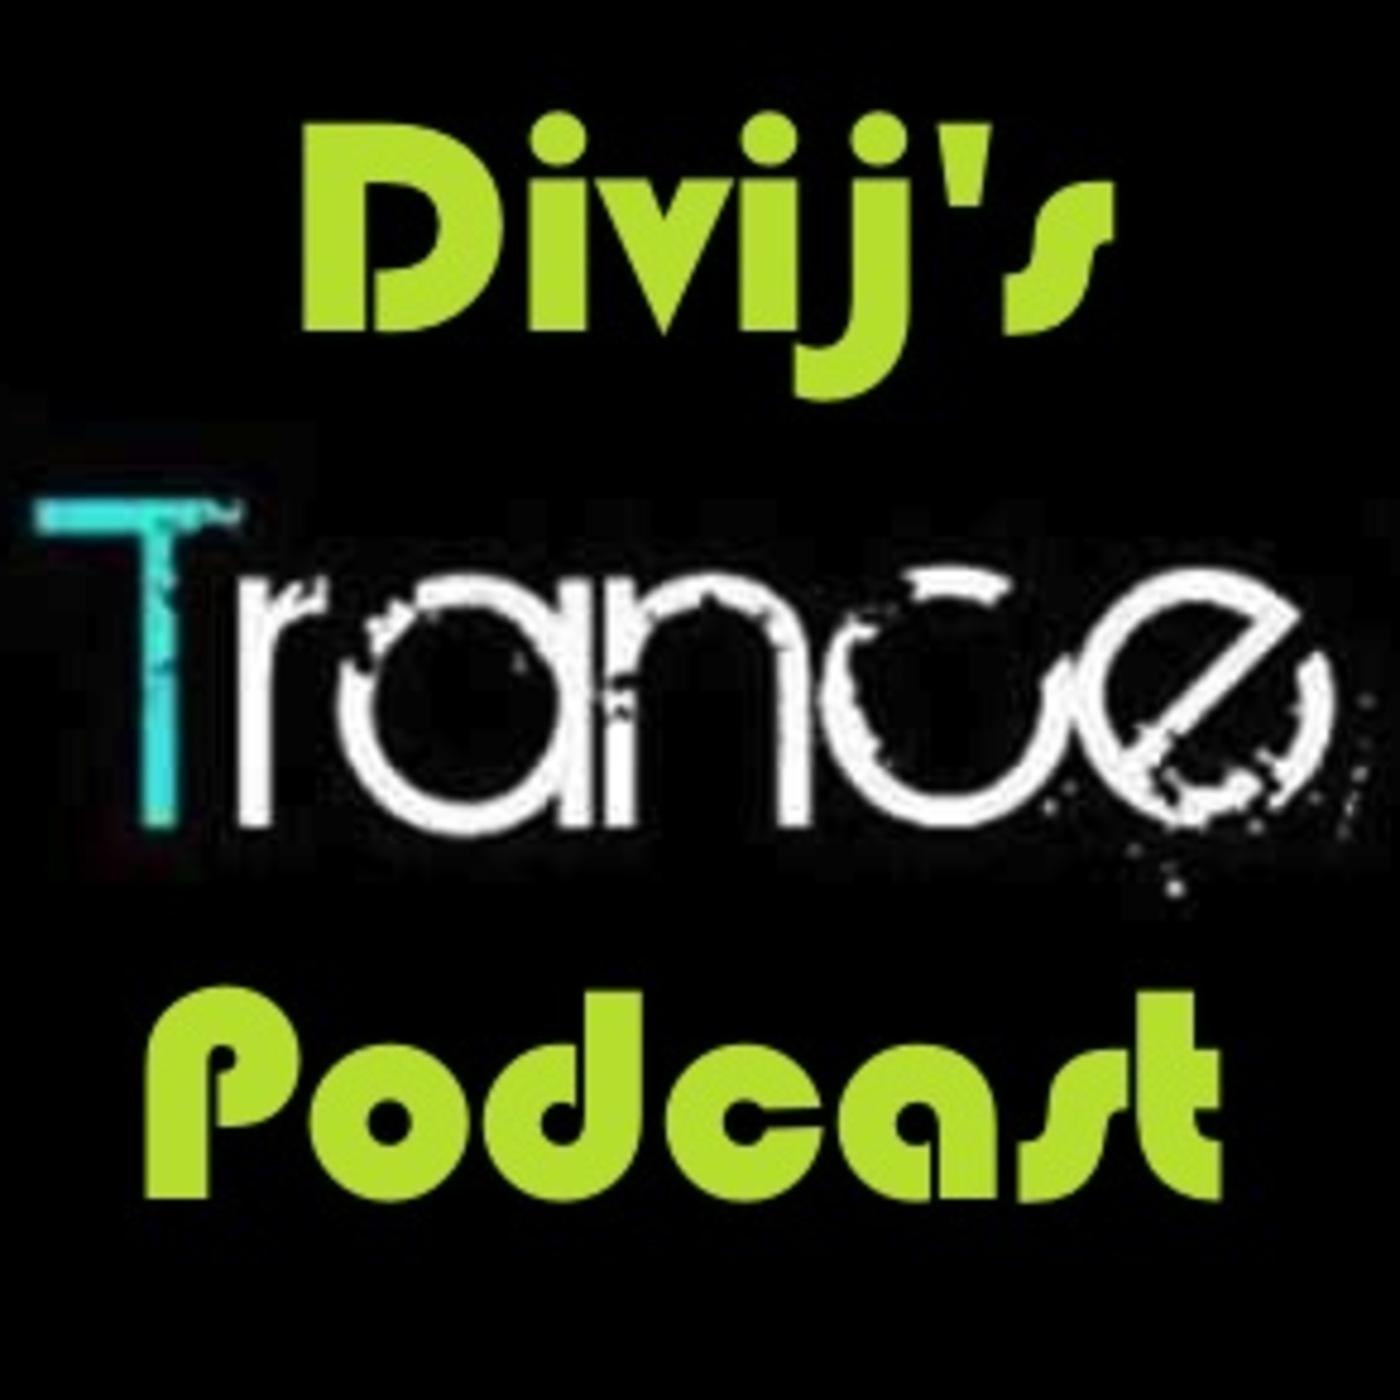 Divij's Trance 4 Life Podcast:Divij Satija